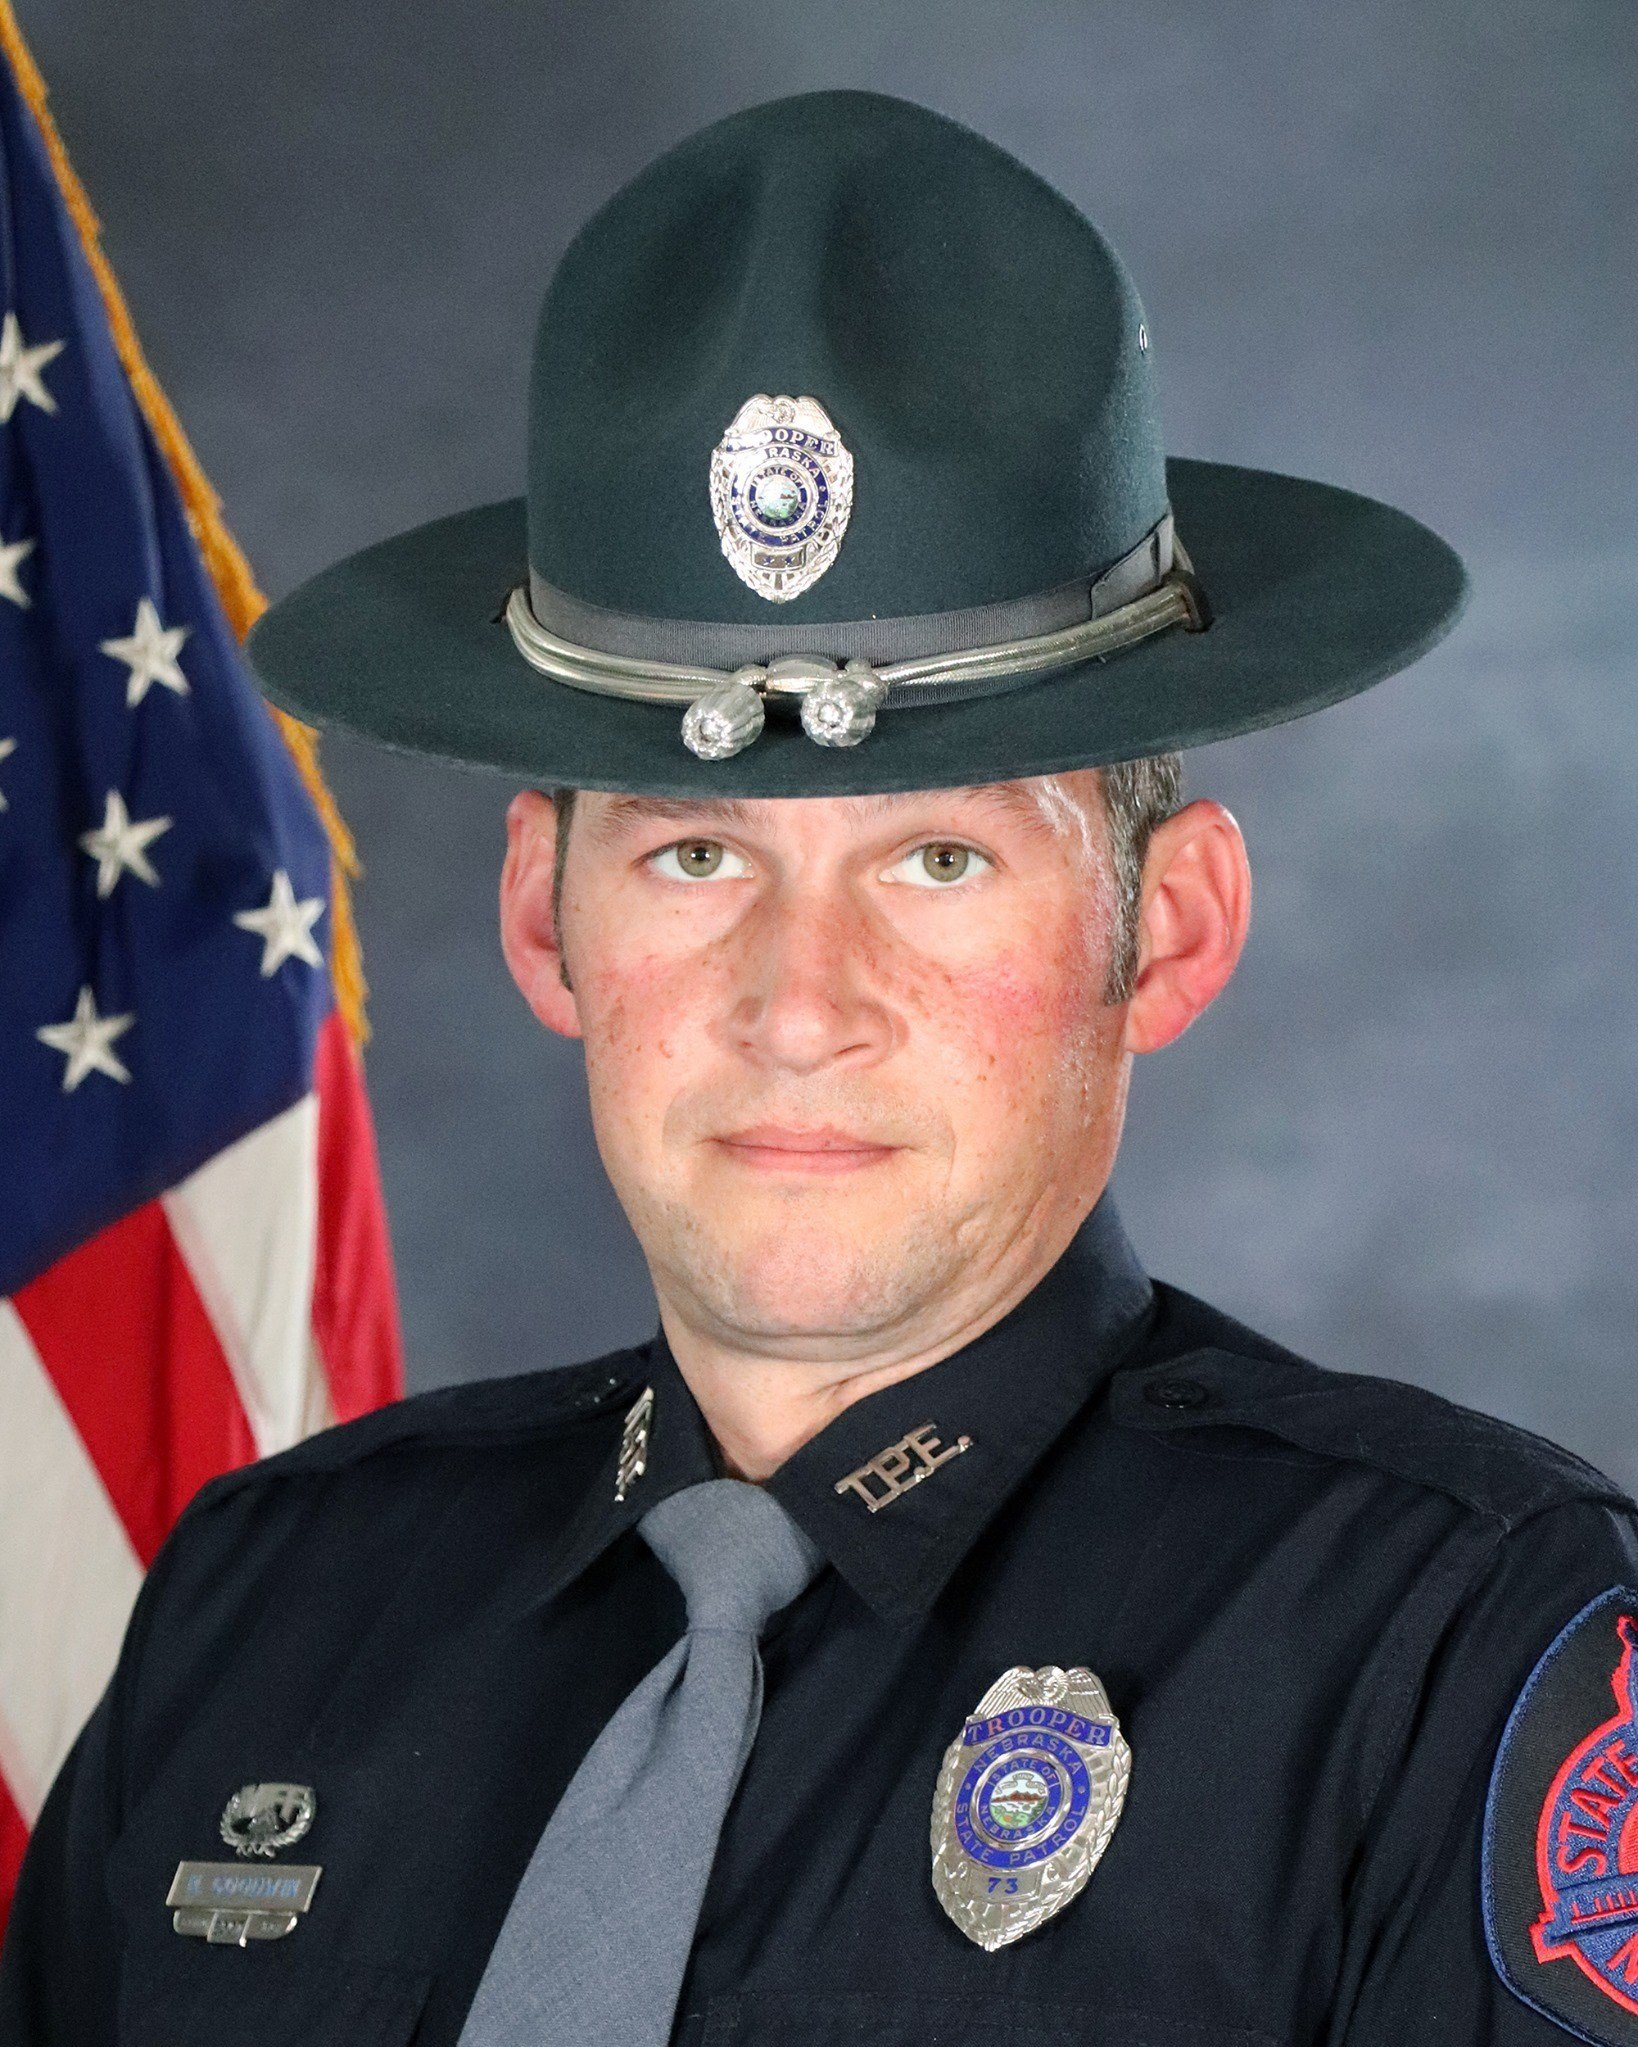 Nebraska State Patrol pays respect to fallen trooper